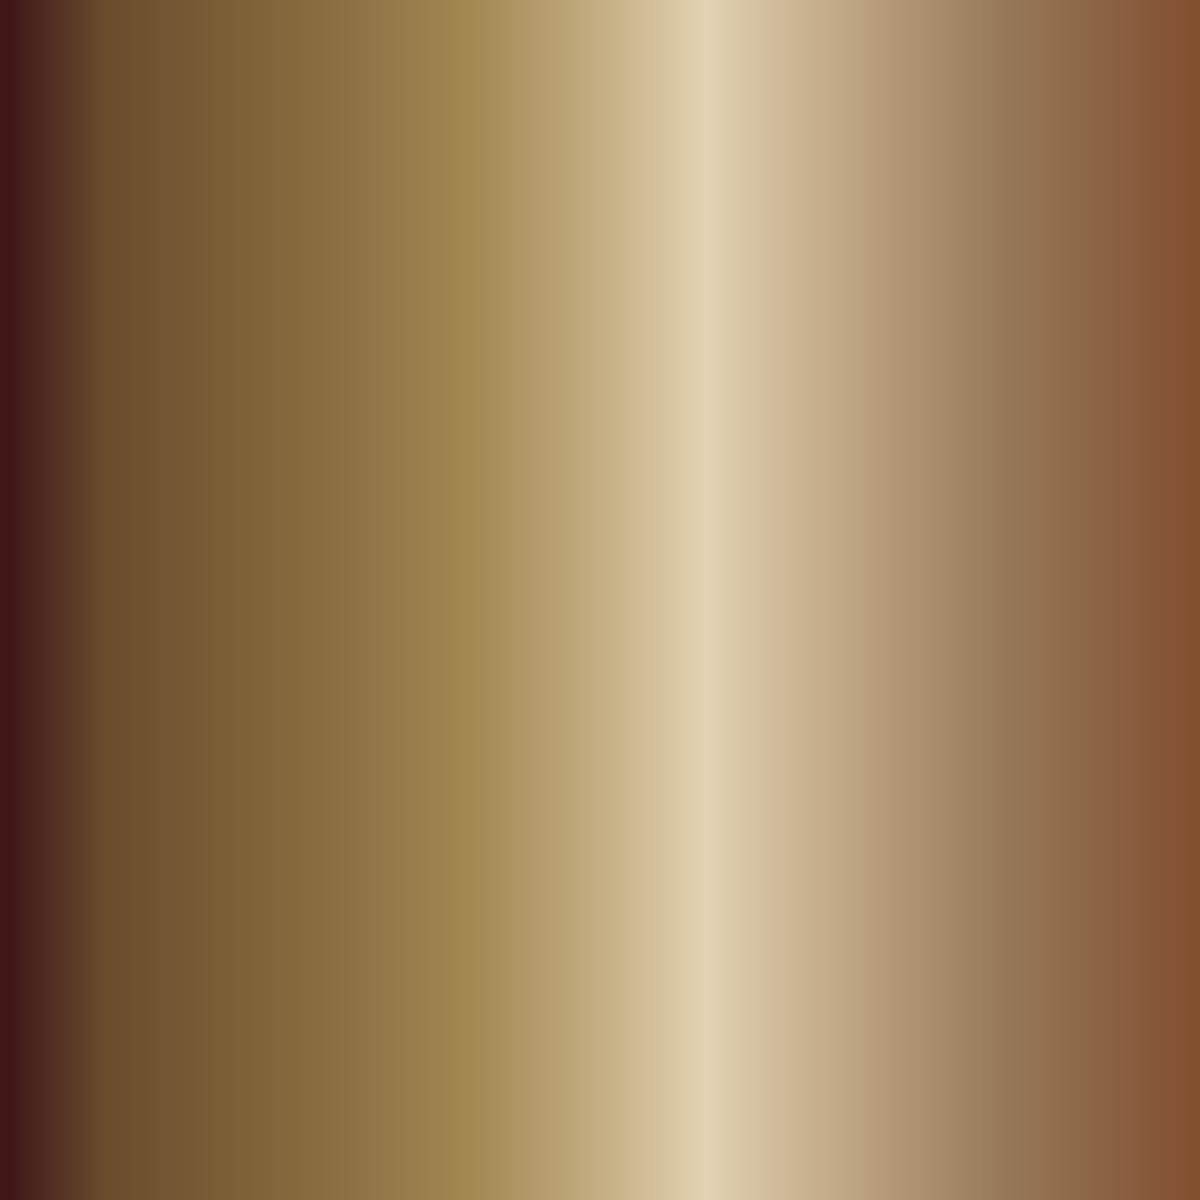 FolkArt ® Brushed Metal™ Acrylic Paint - Bronze, 2 oz.